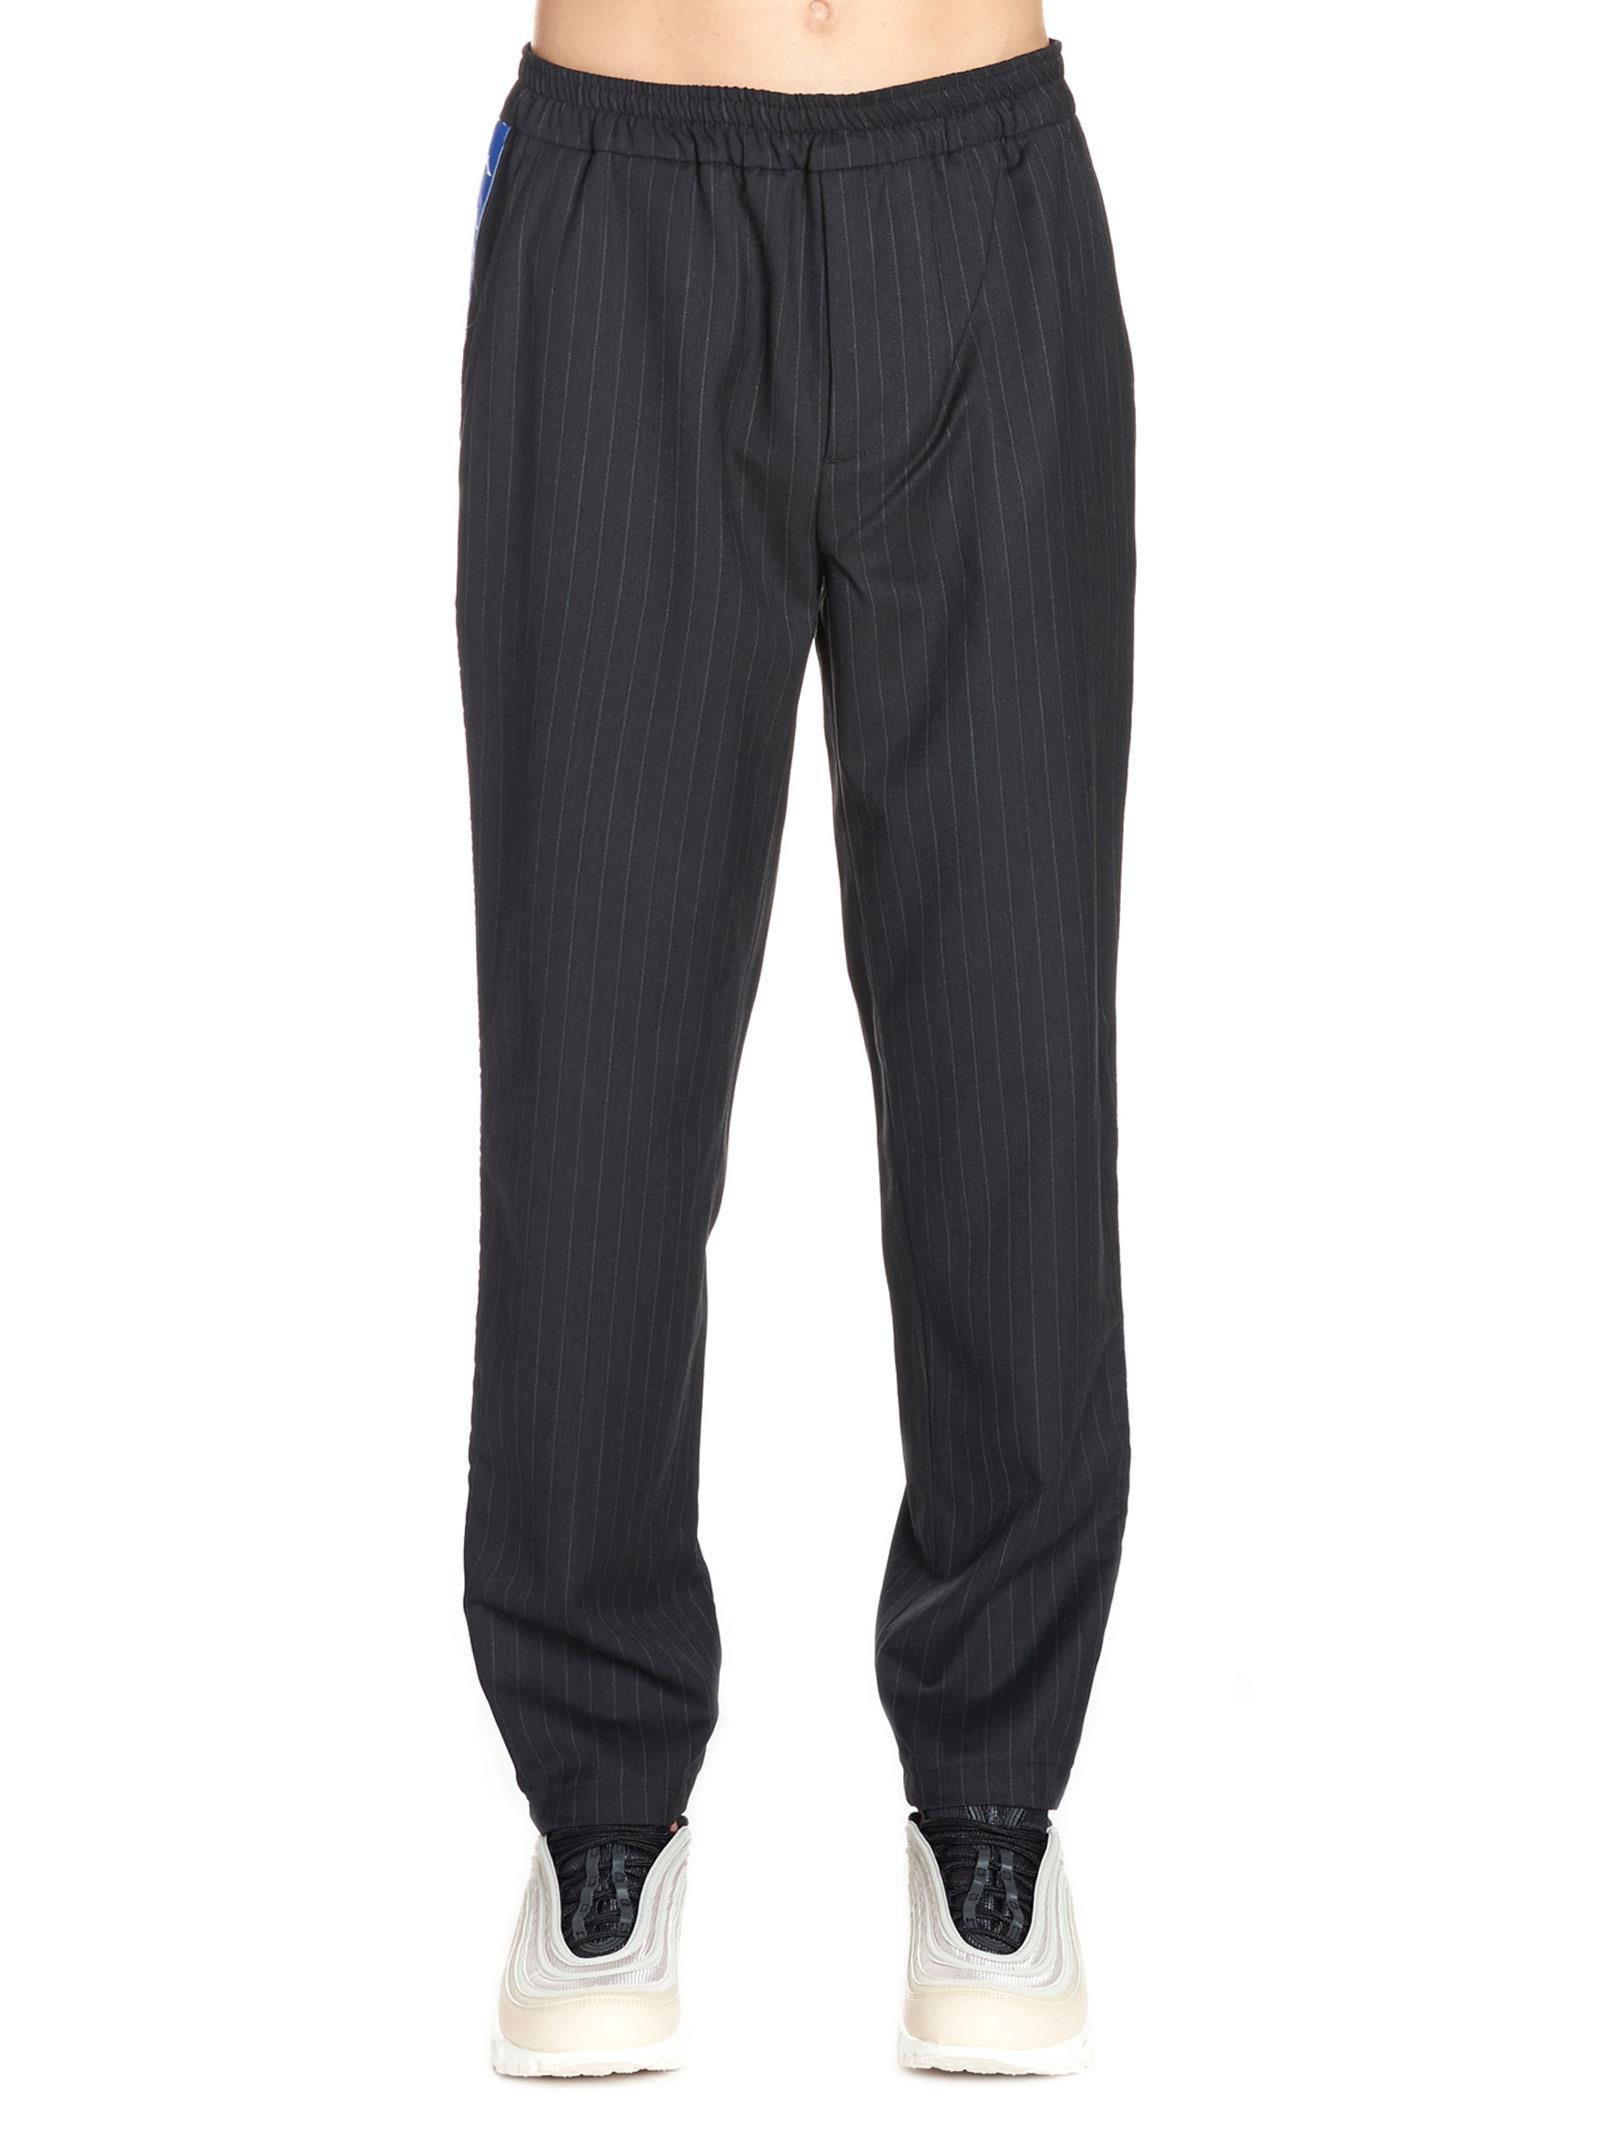 eb525250 Danilo Paura X Kappa 'mardin' Pants